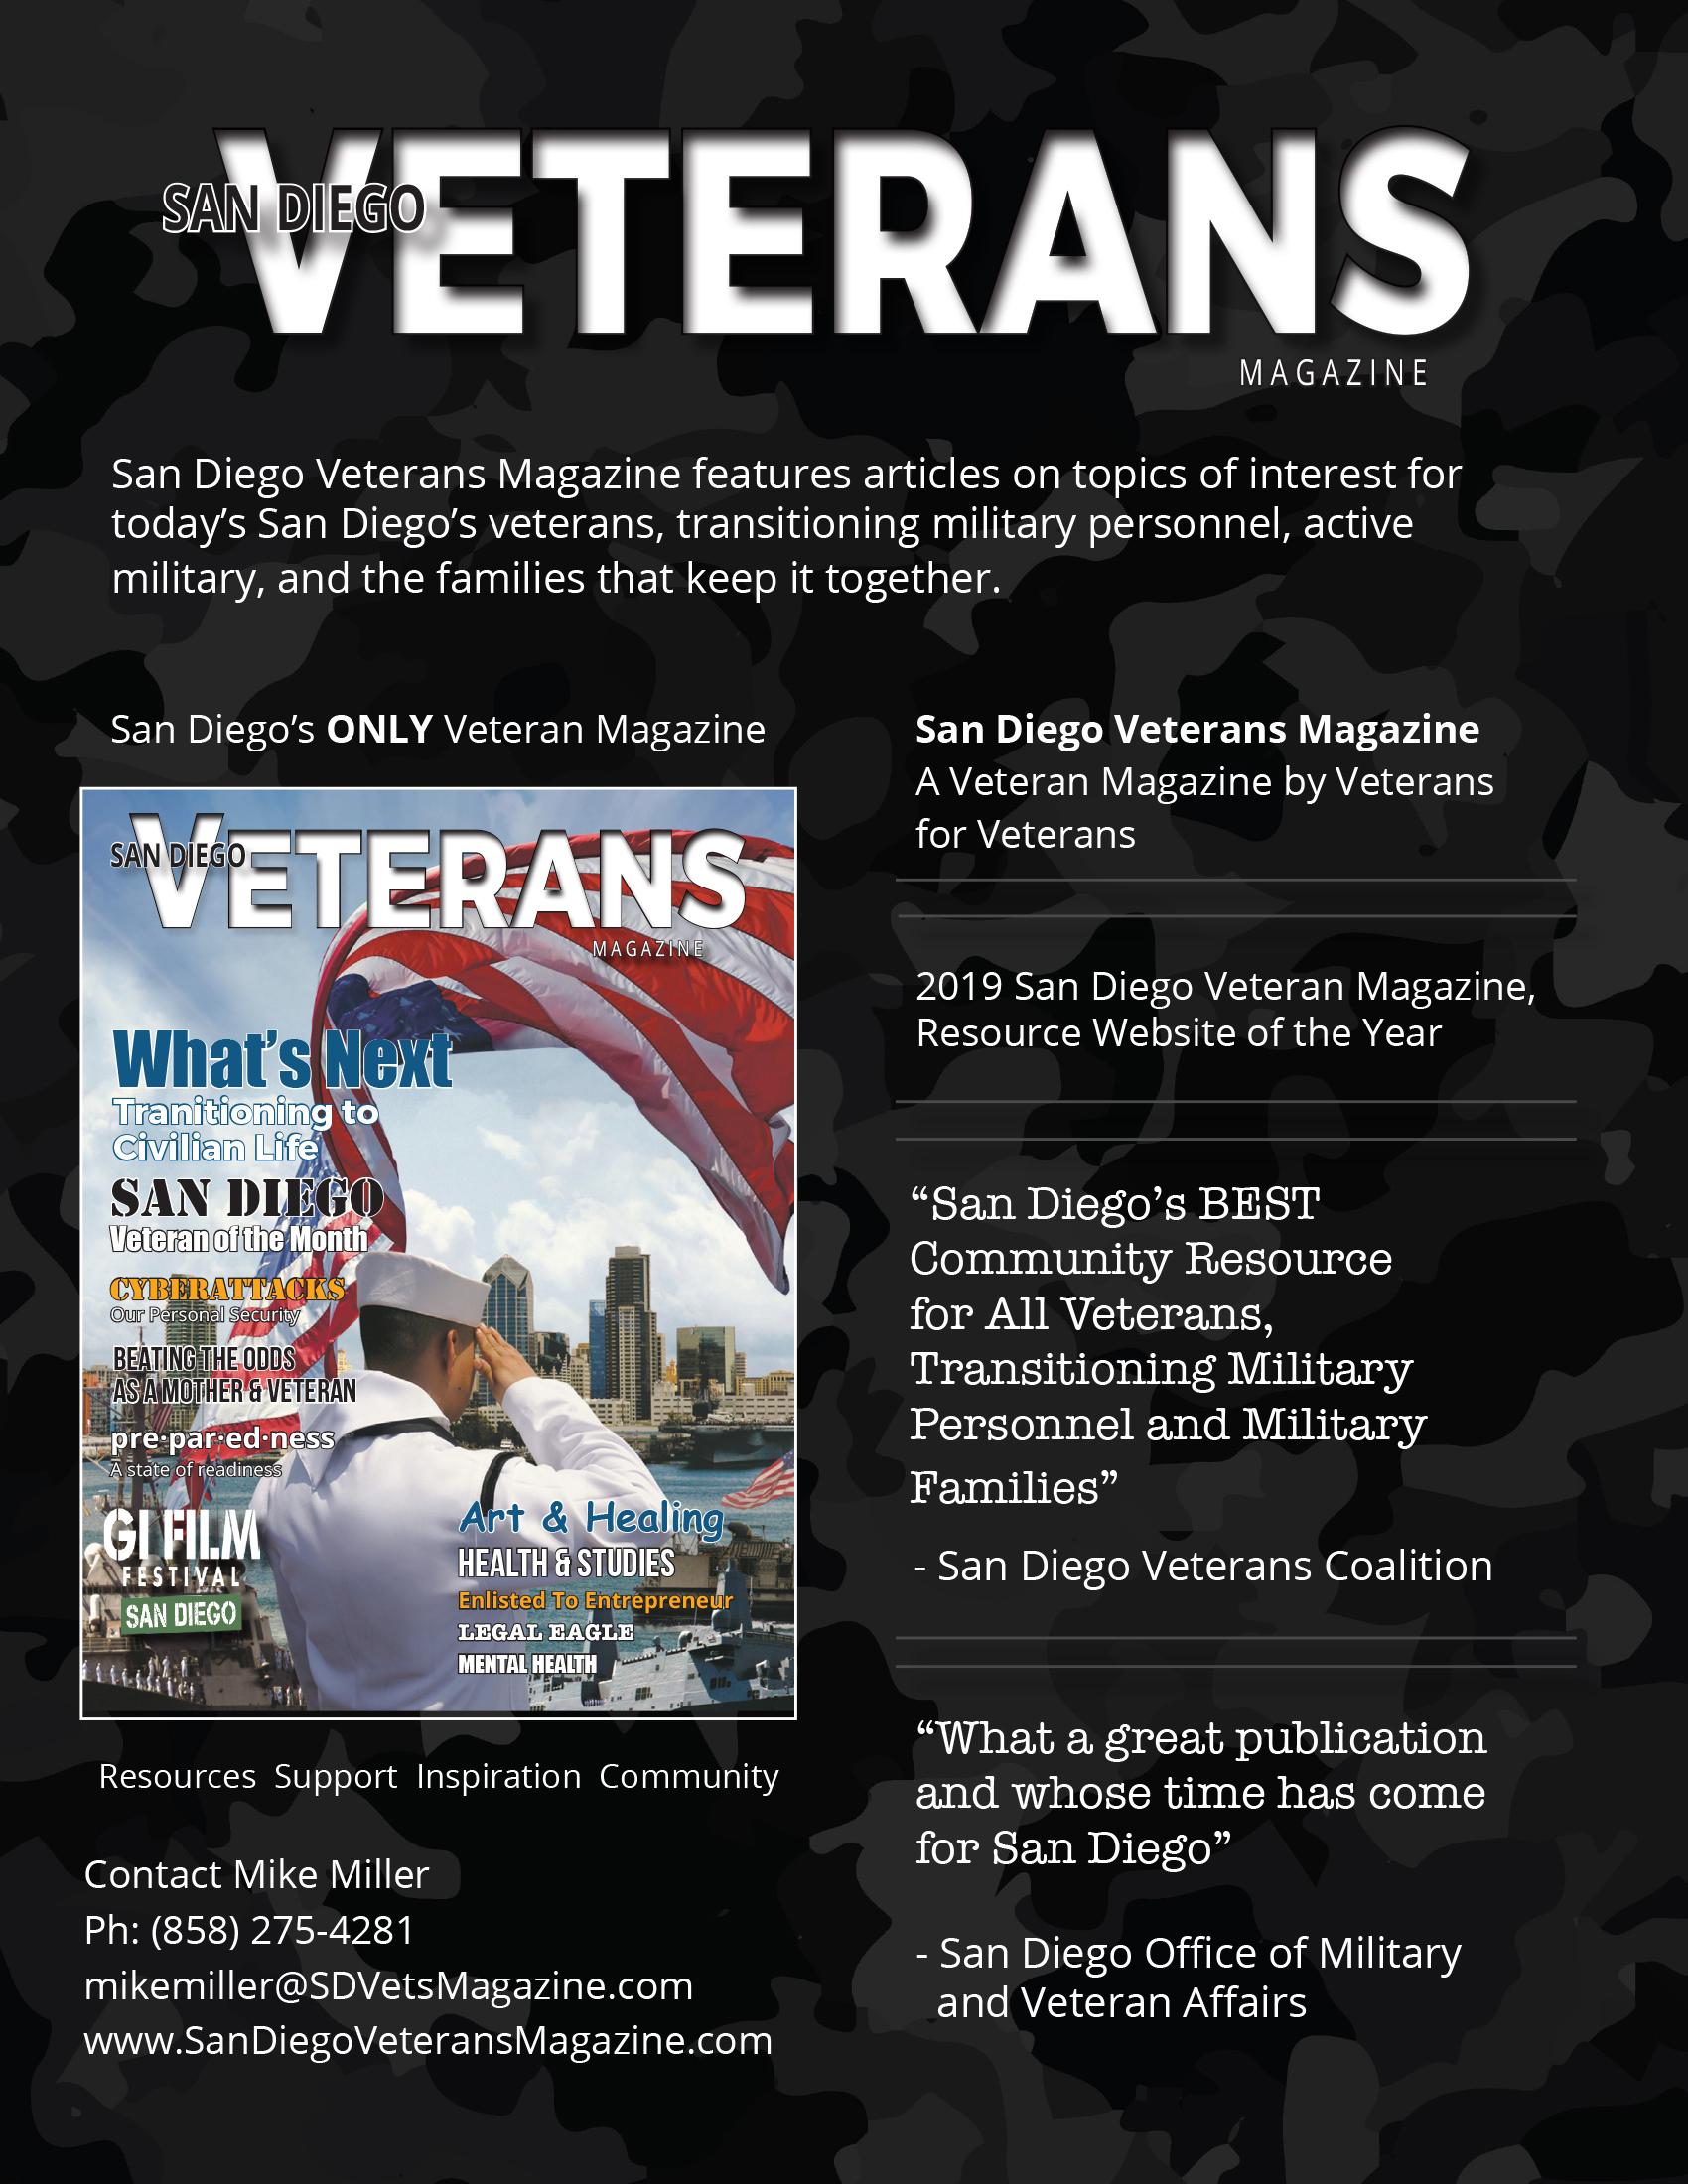 https://sandiegoveteransmagazine.com/wp-content/uploads/2020/04/SDV-1.jpg